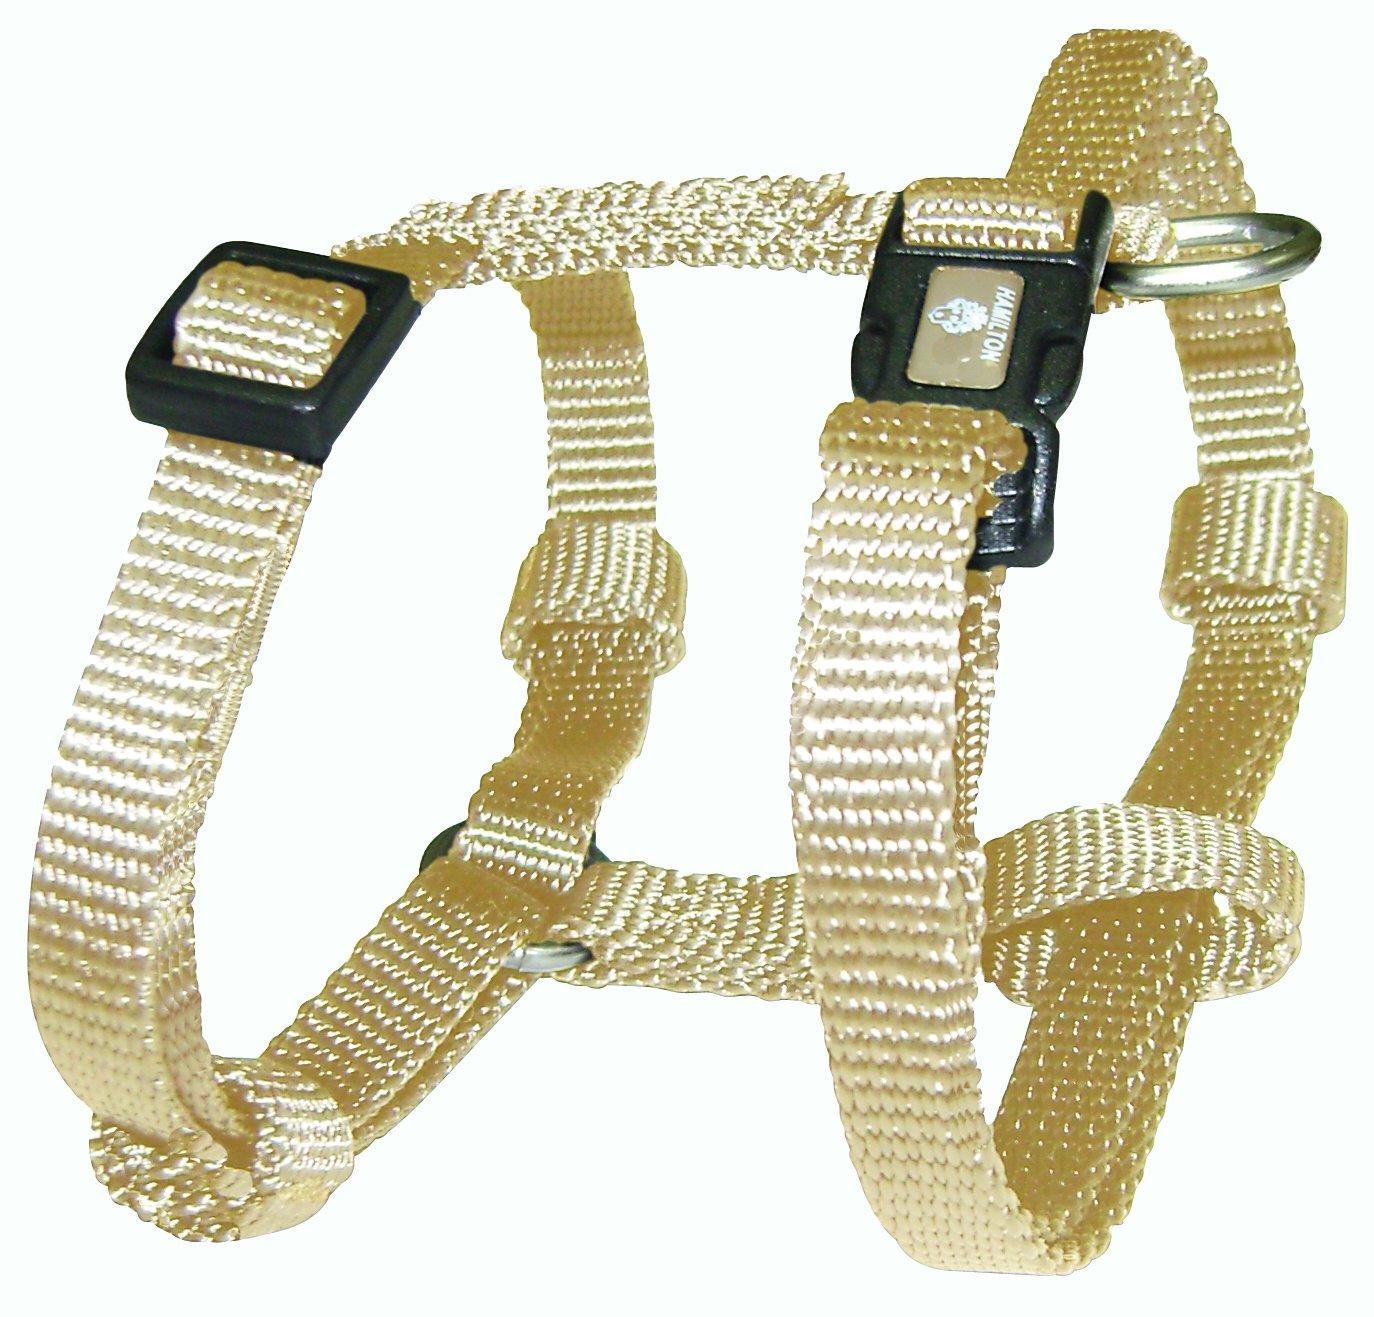 Hamilton Adjustable Comfort Dog Harness, X-Small, Sage Green